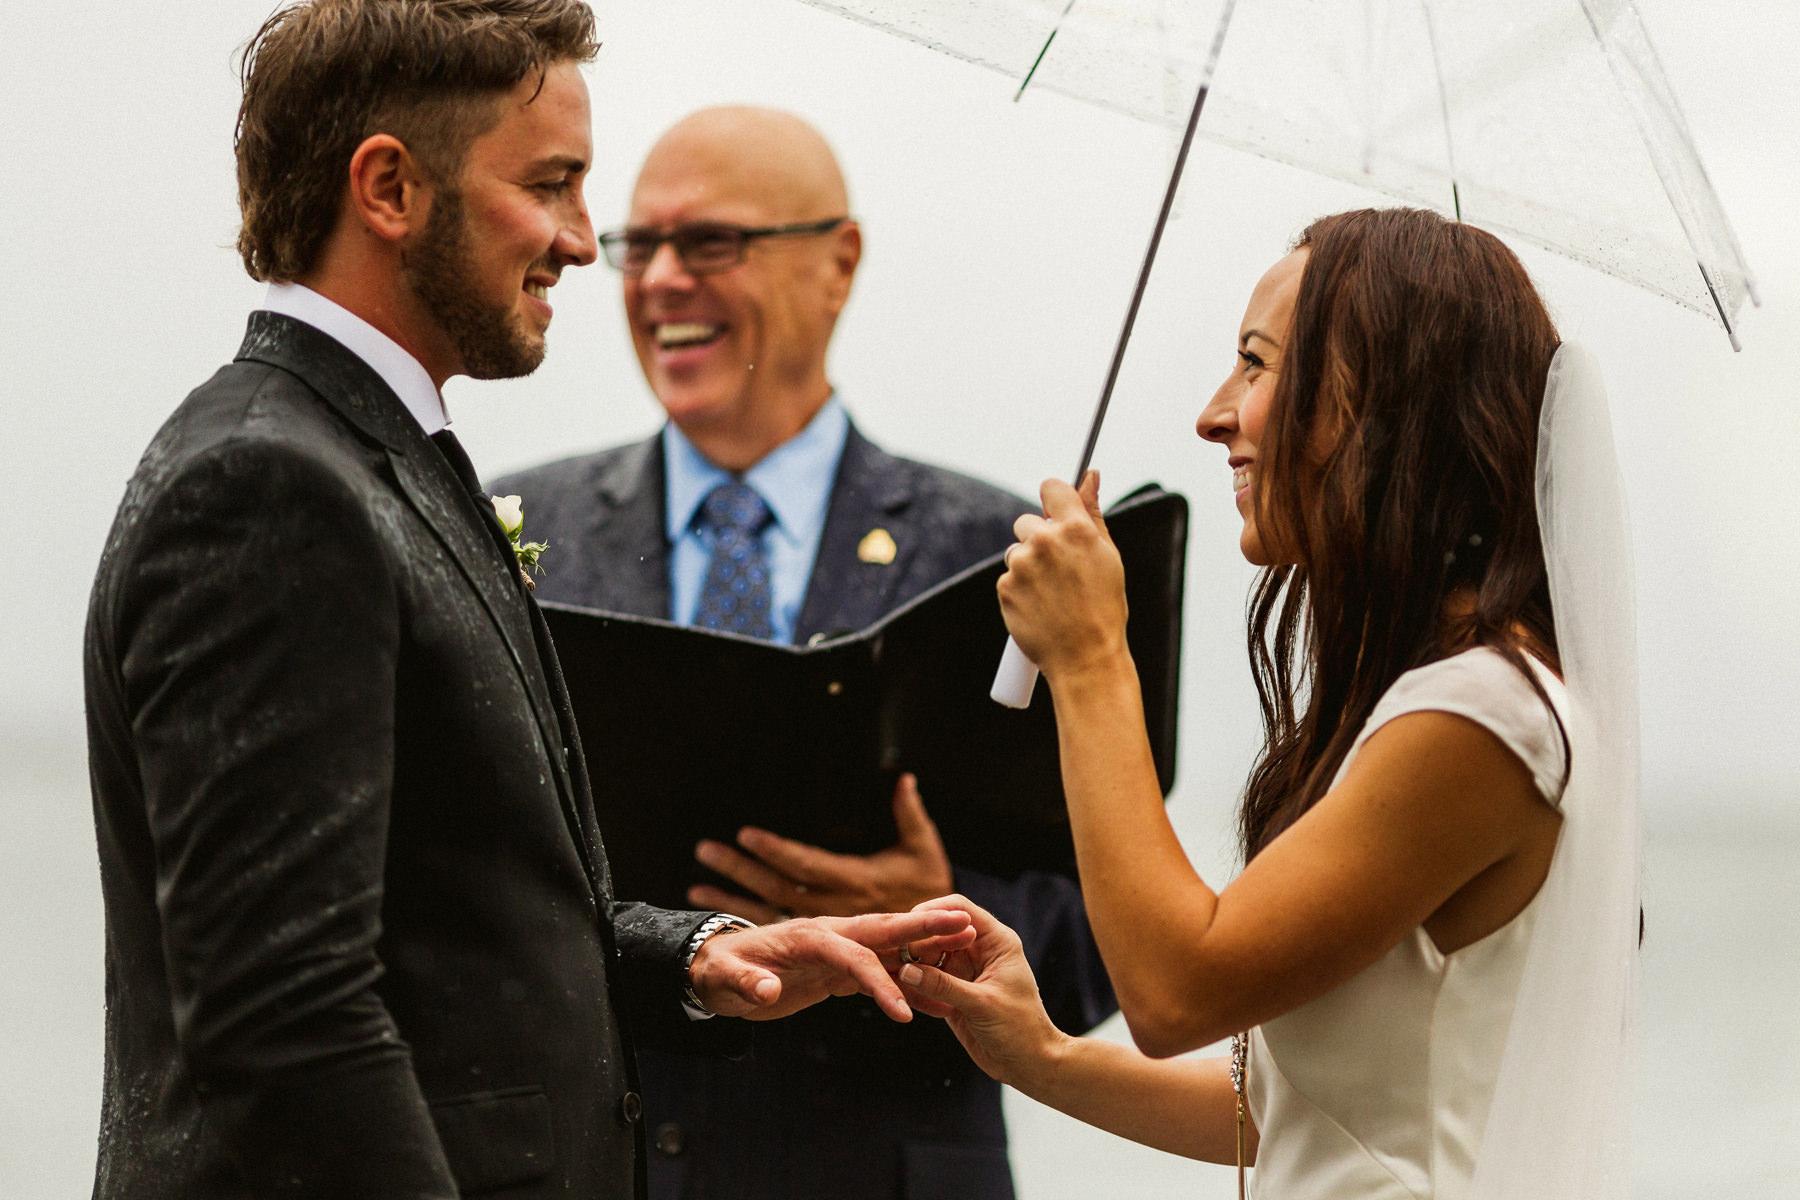 Tsawwassen Wedding in the rain